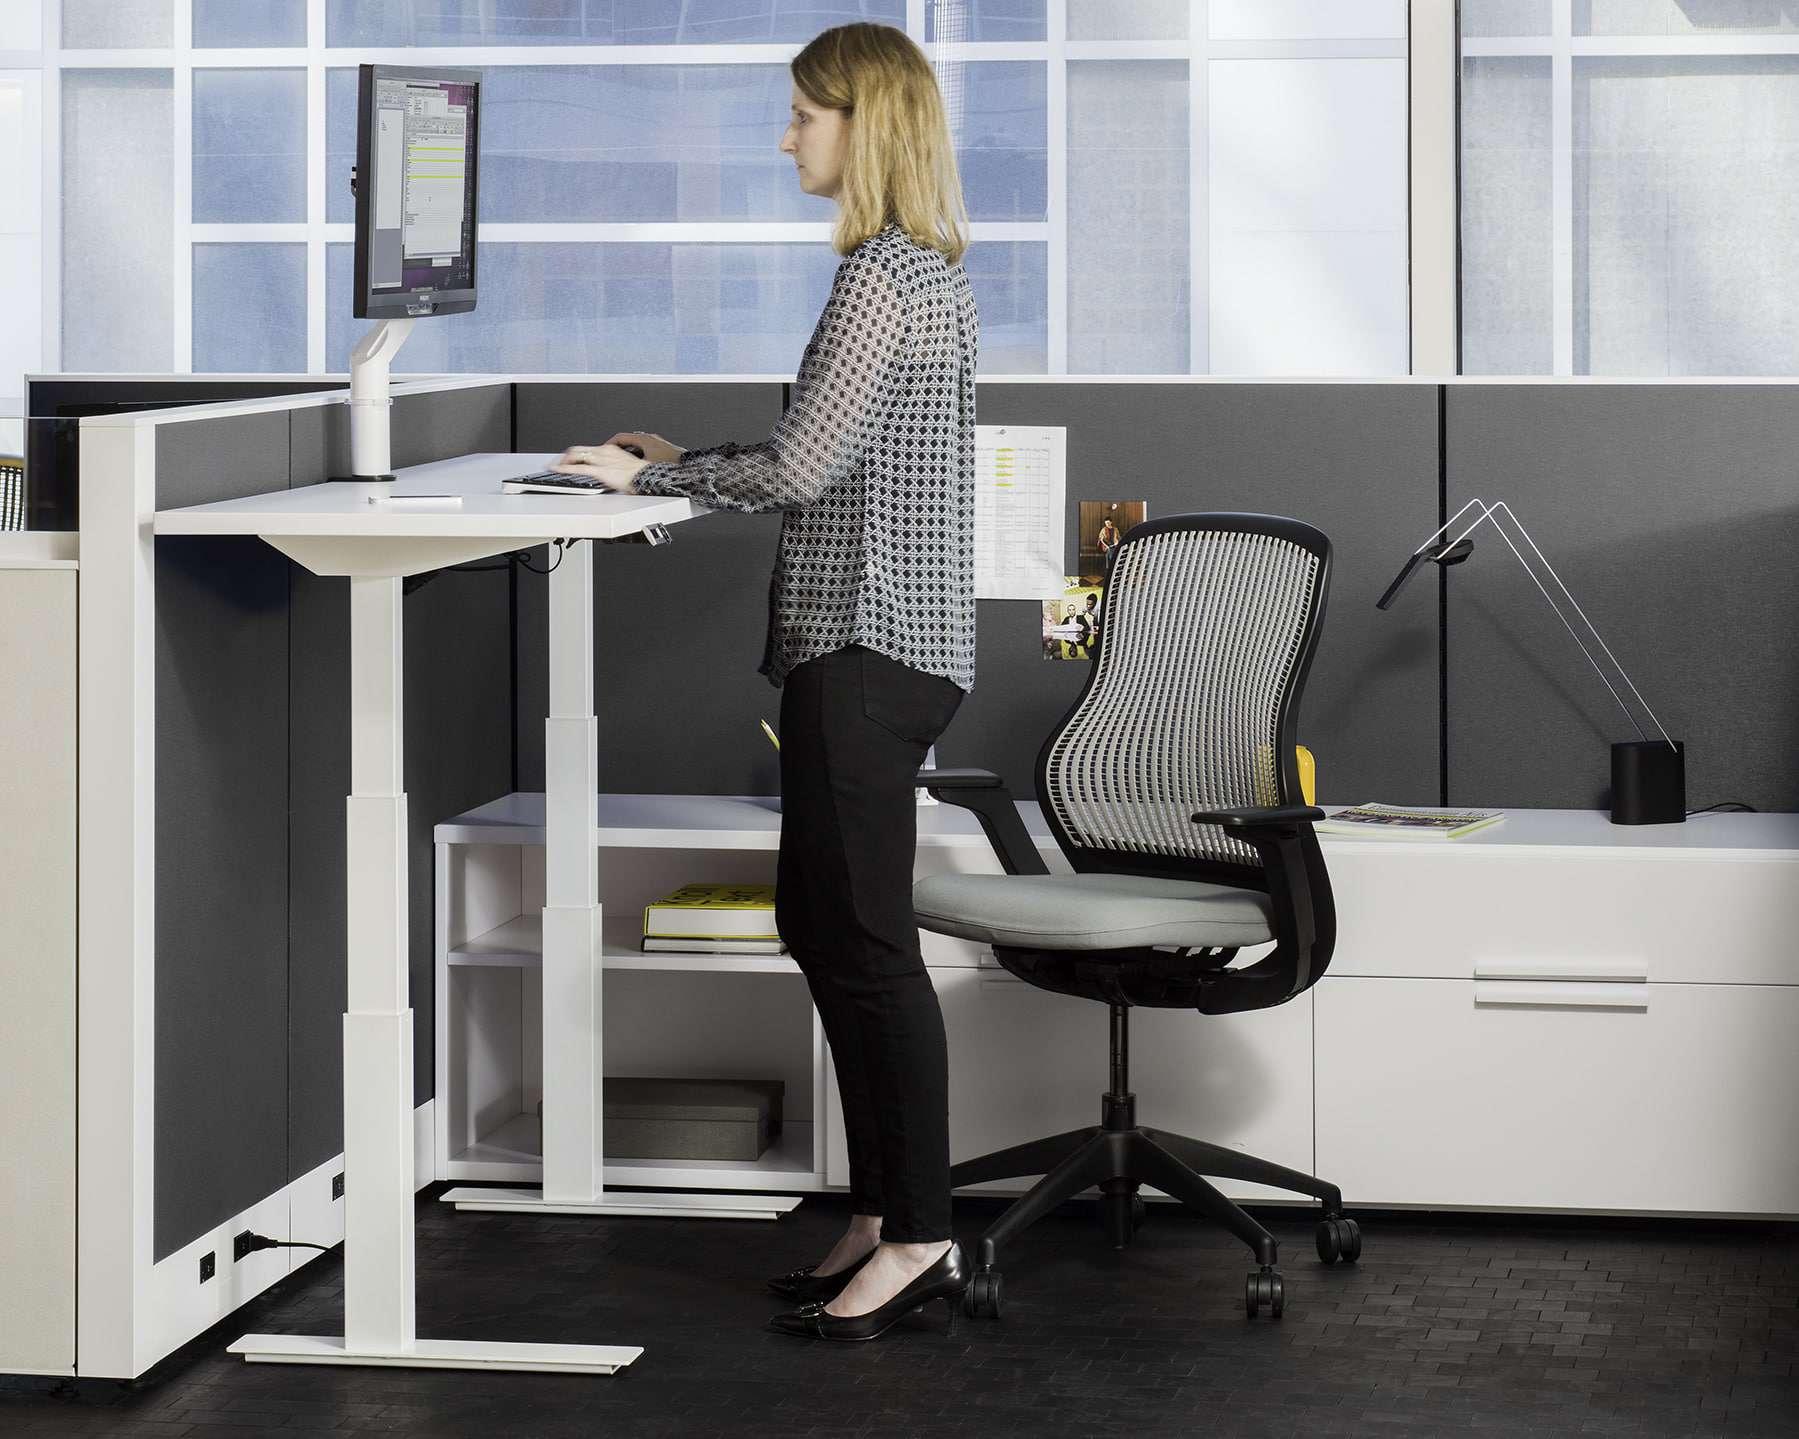 The Ergonomic Office Furniture Advantage